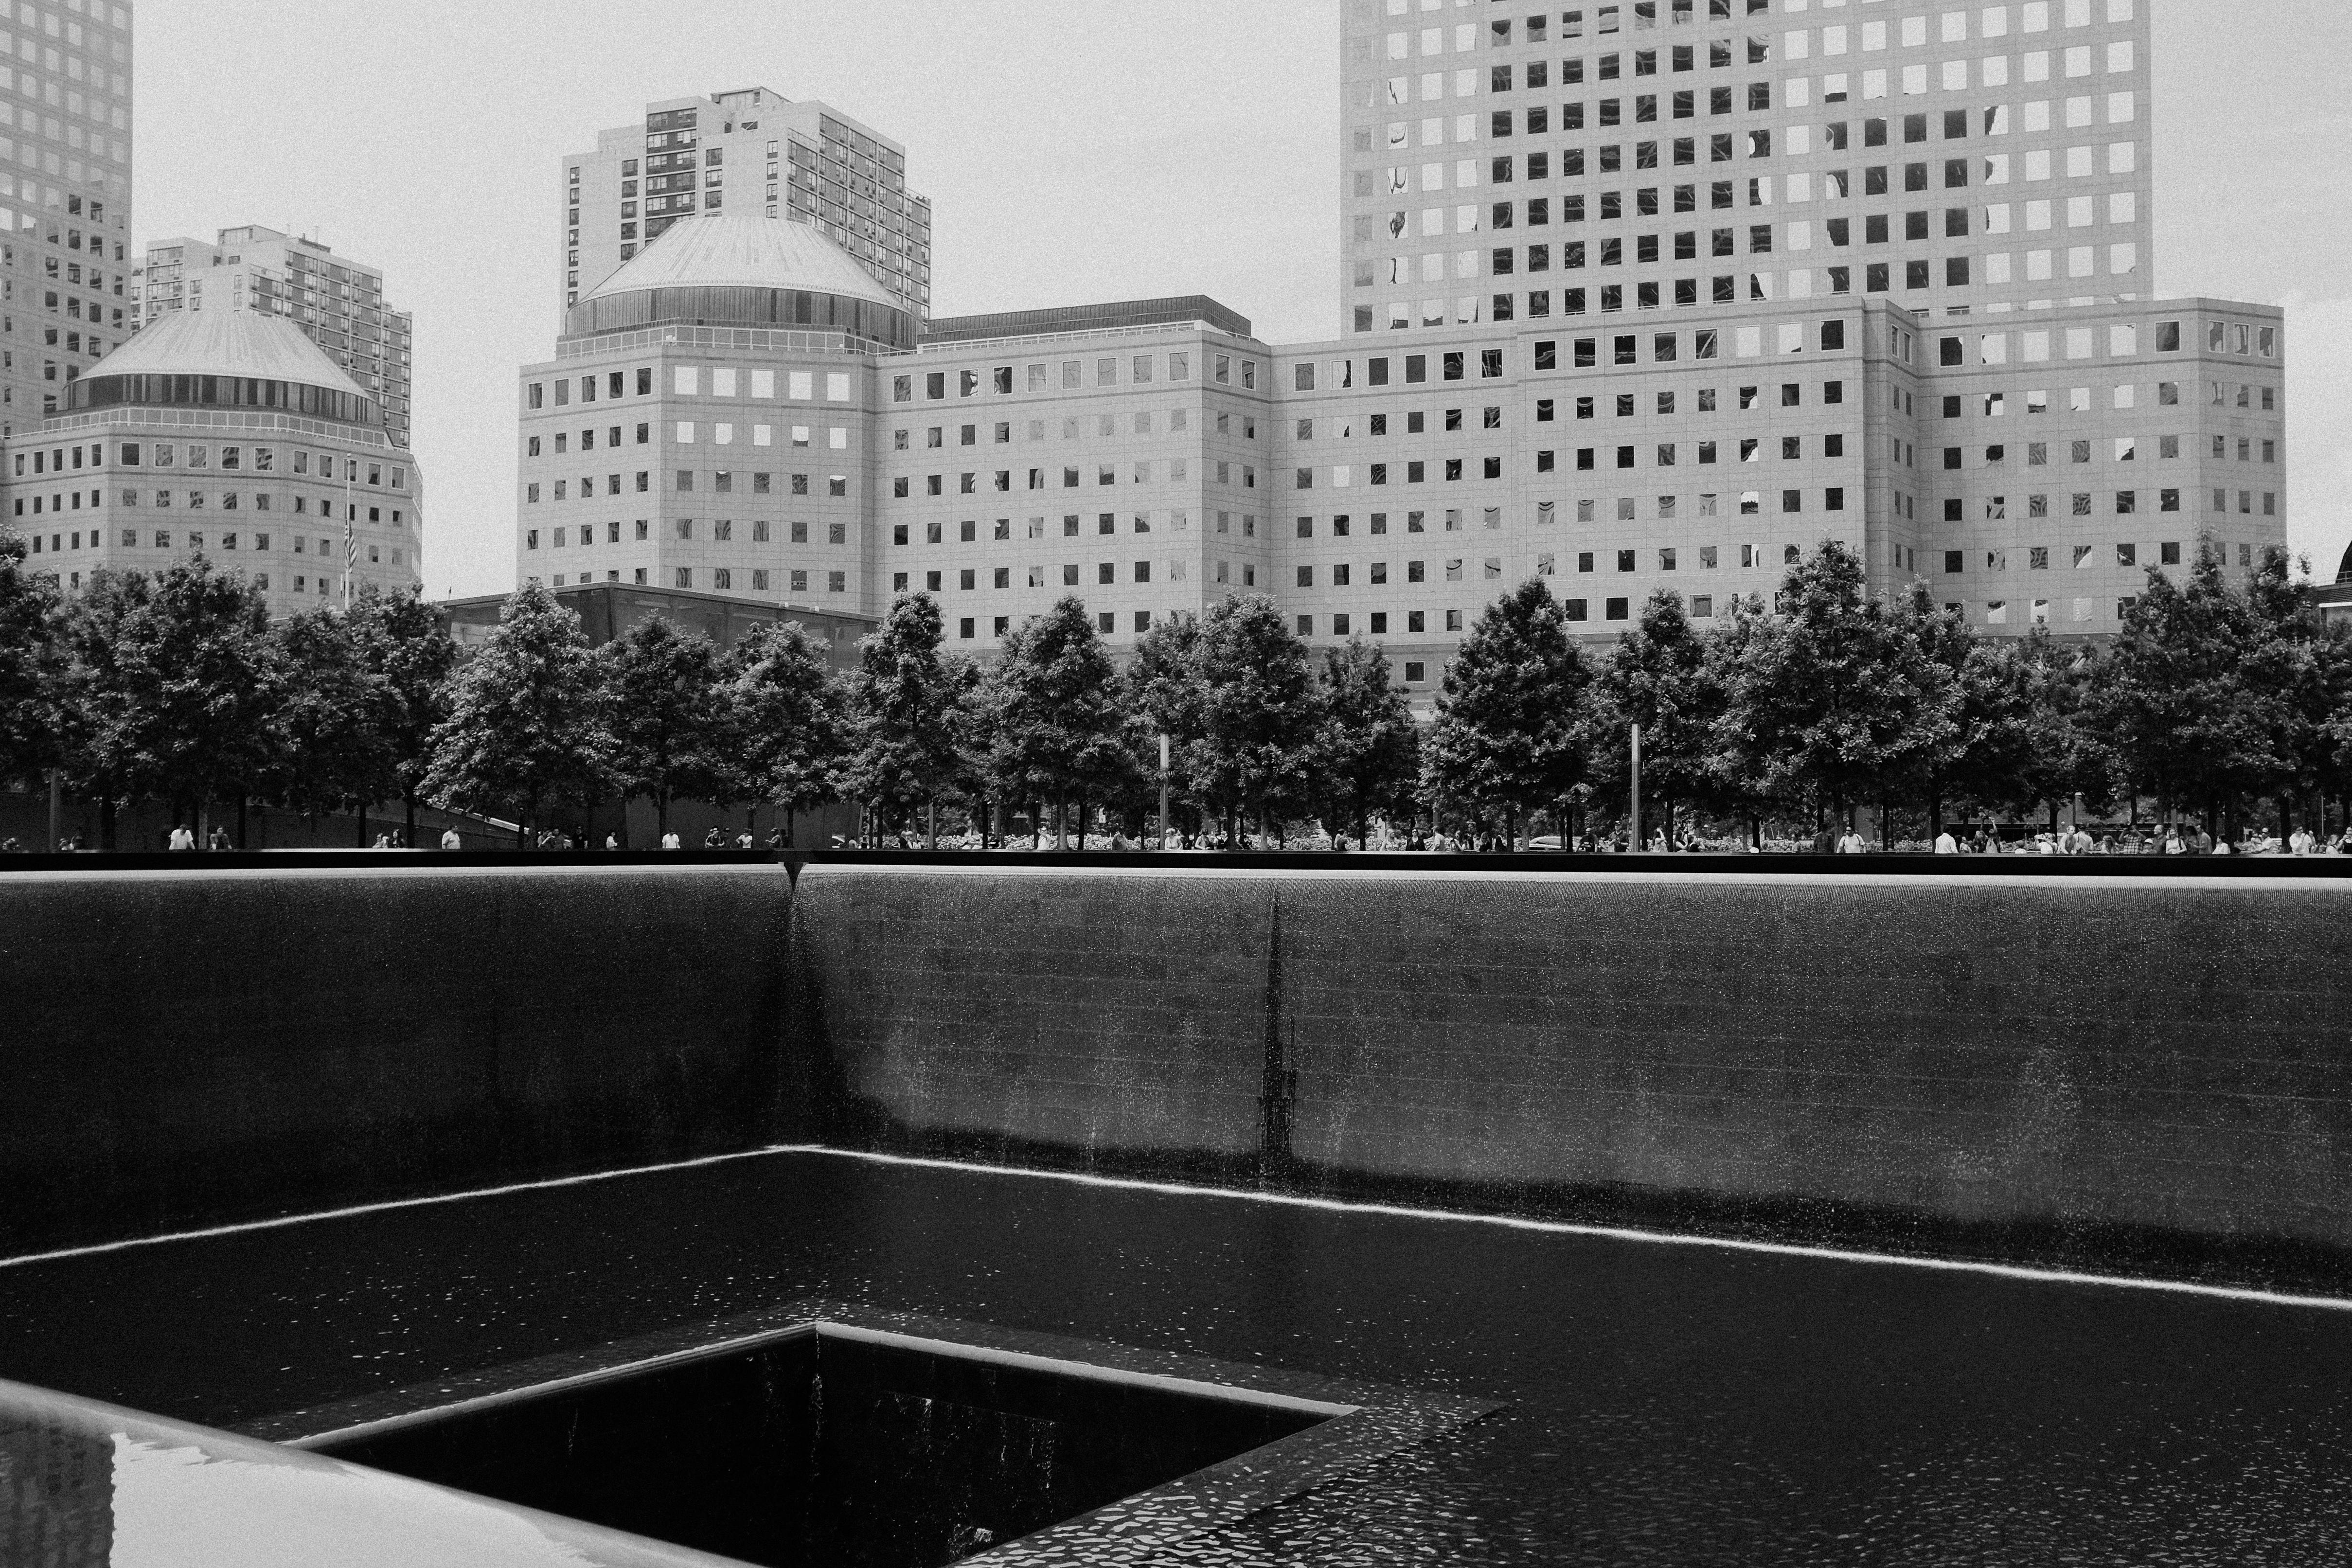 newyork-melissamilis-93